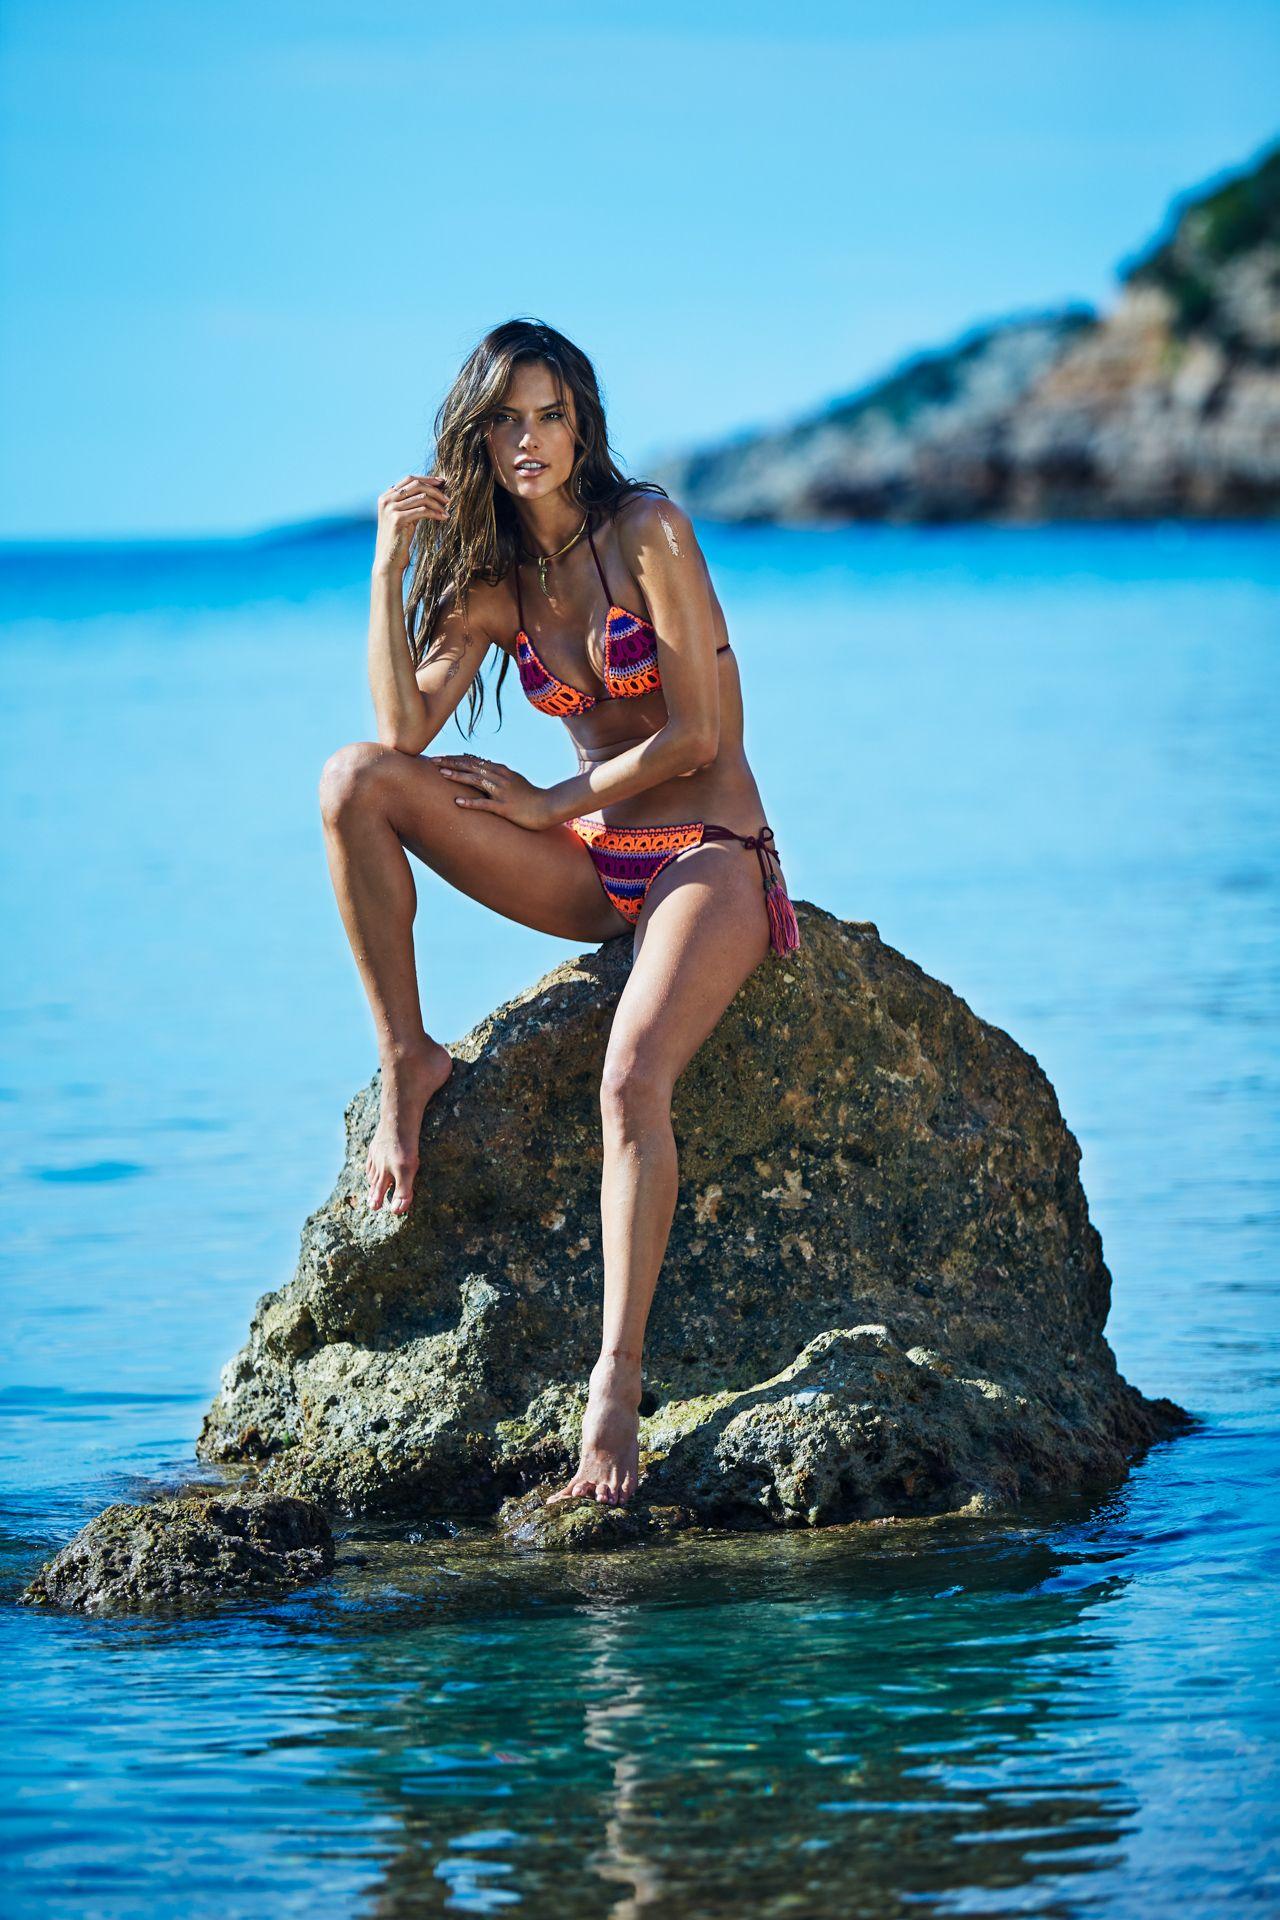 Alessandra Ambrosio Bikini Photos